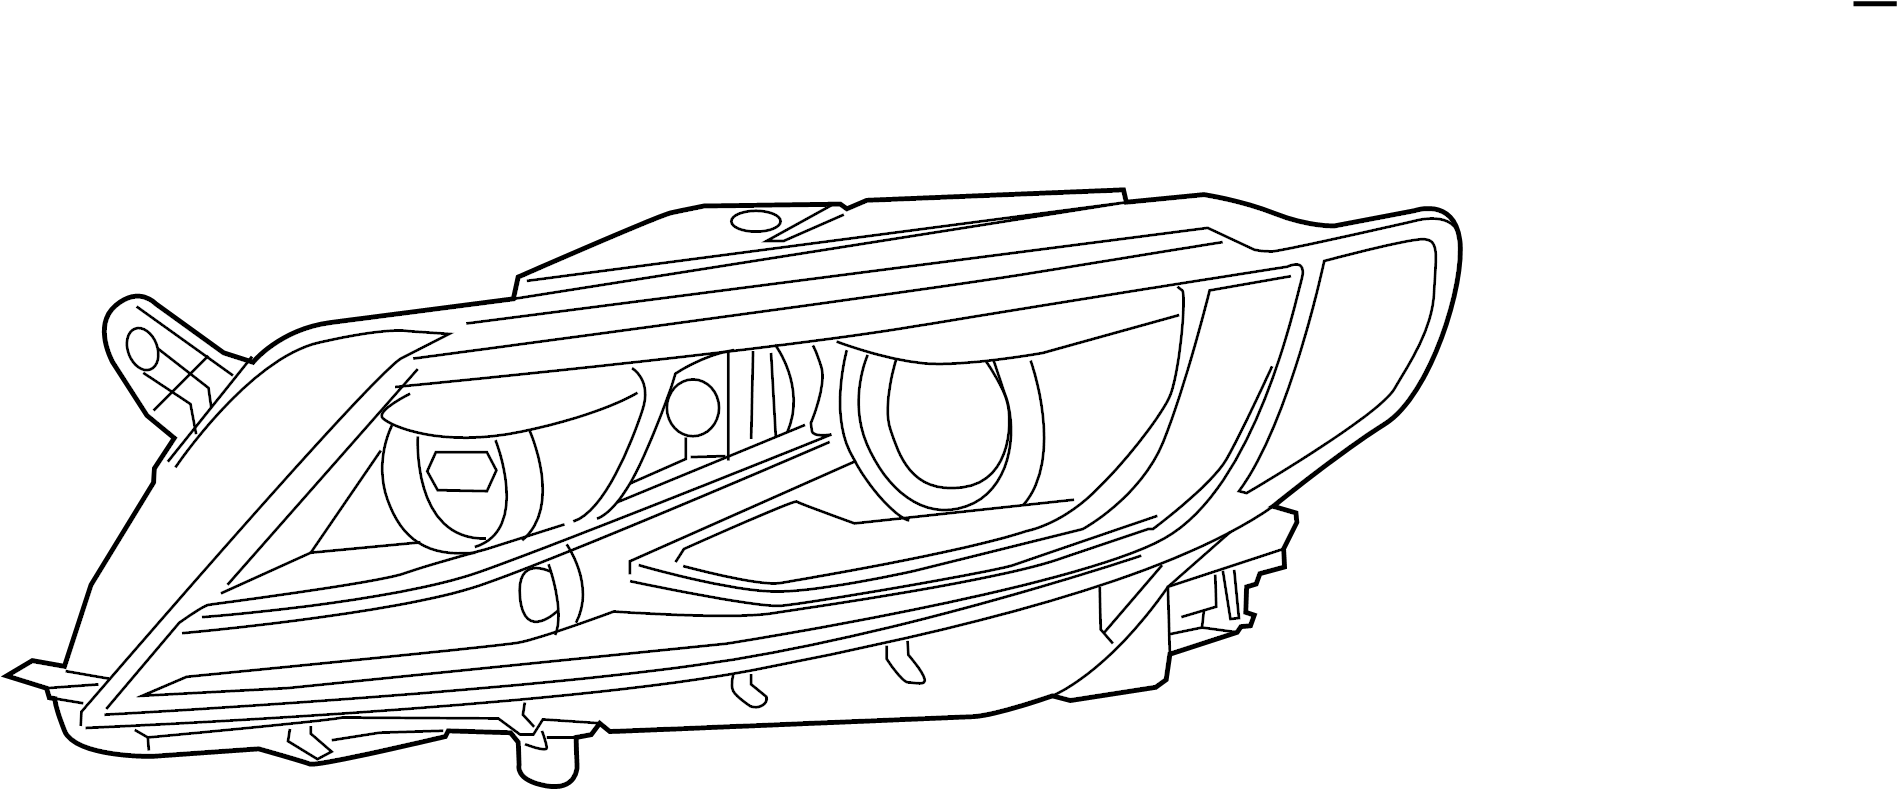 Post 2013 Volkswagen Jetta Fuse Box Diagram 272397 besides Door Chrome Side Molding Set Passat CC P2196996 in addition Pullman Dei Cartoni Animati additionally 365917538465316011 moreover 3C0907530N. on black vw cc